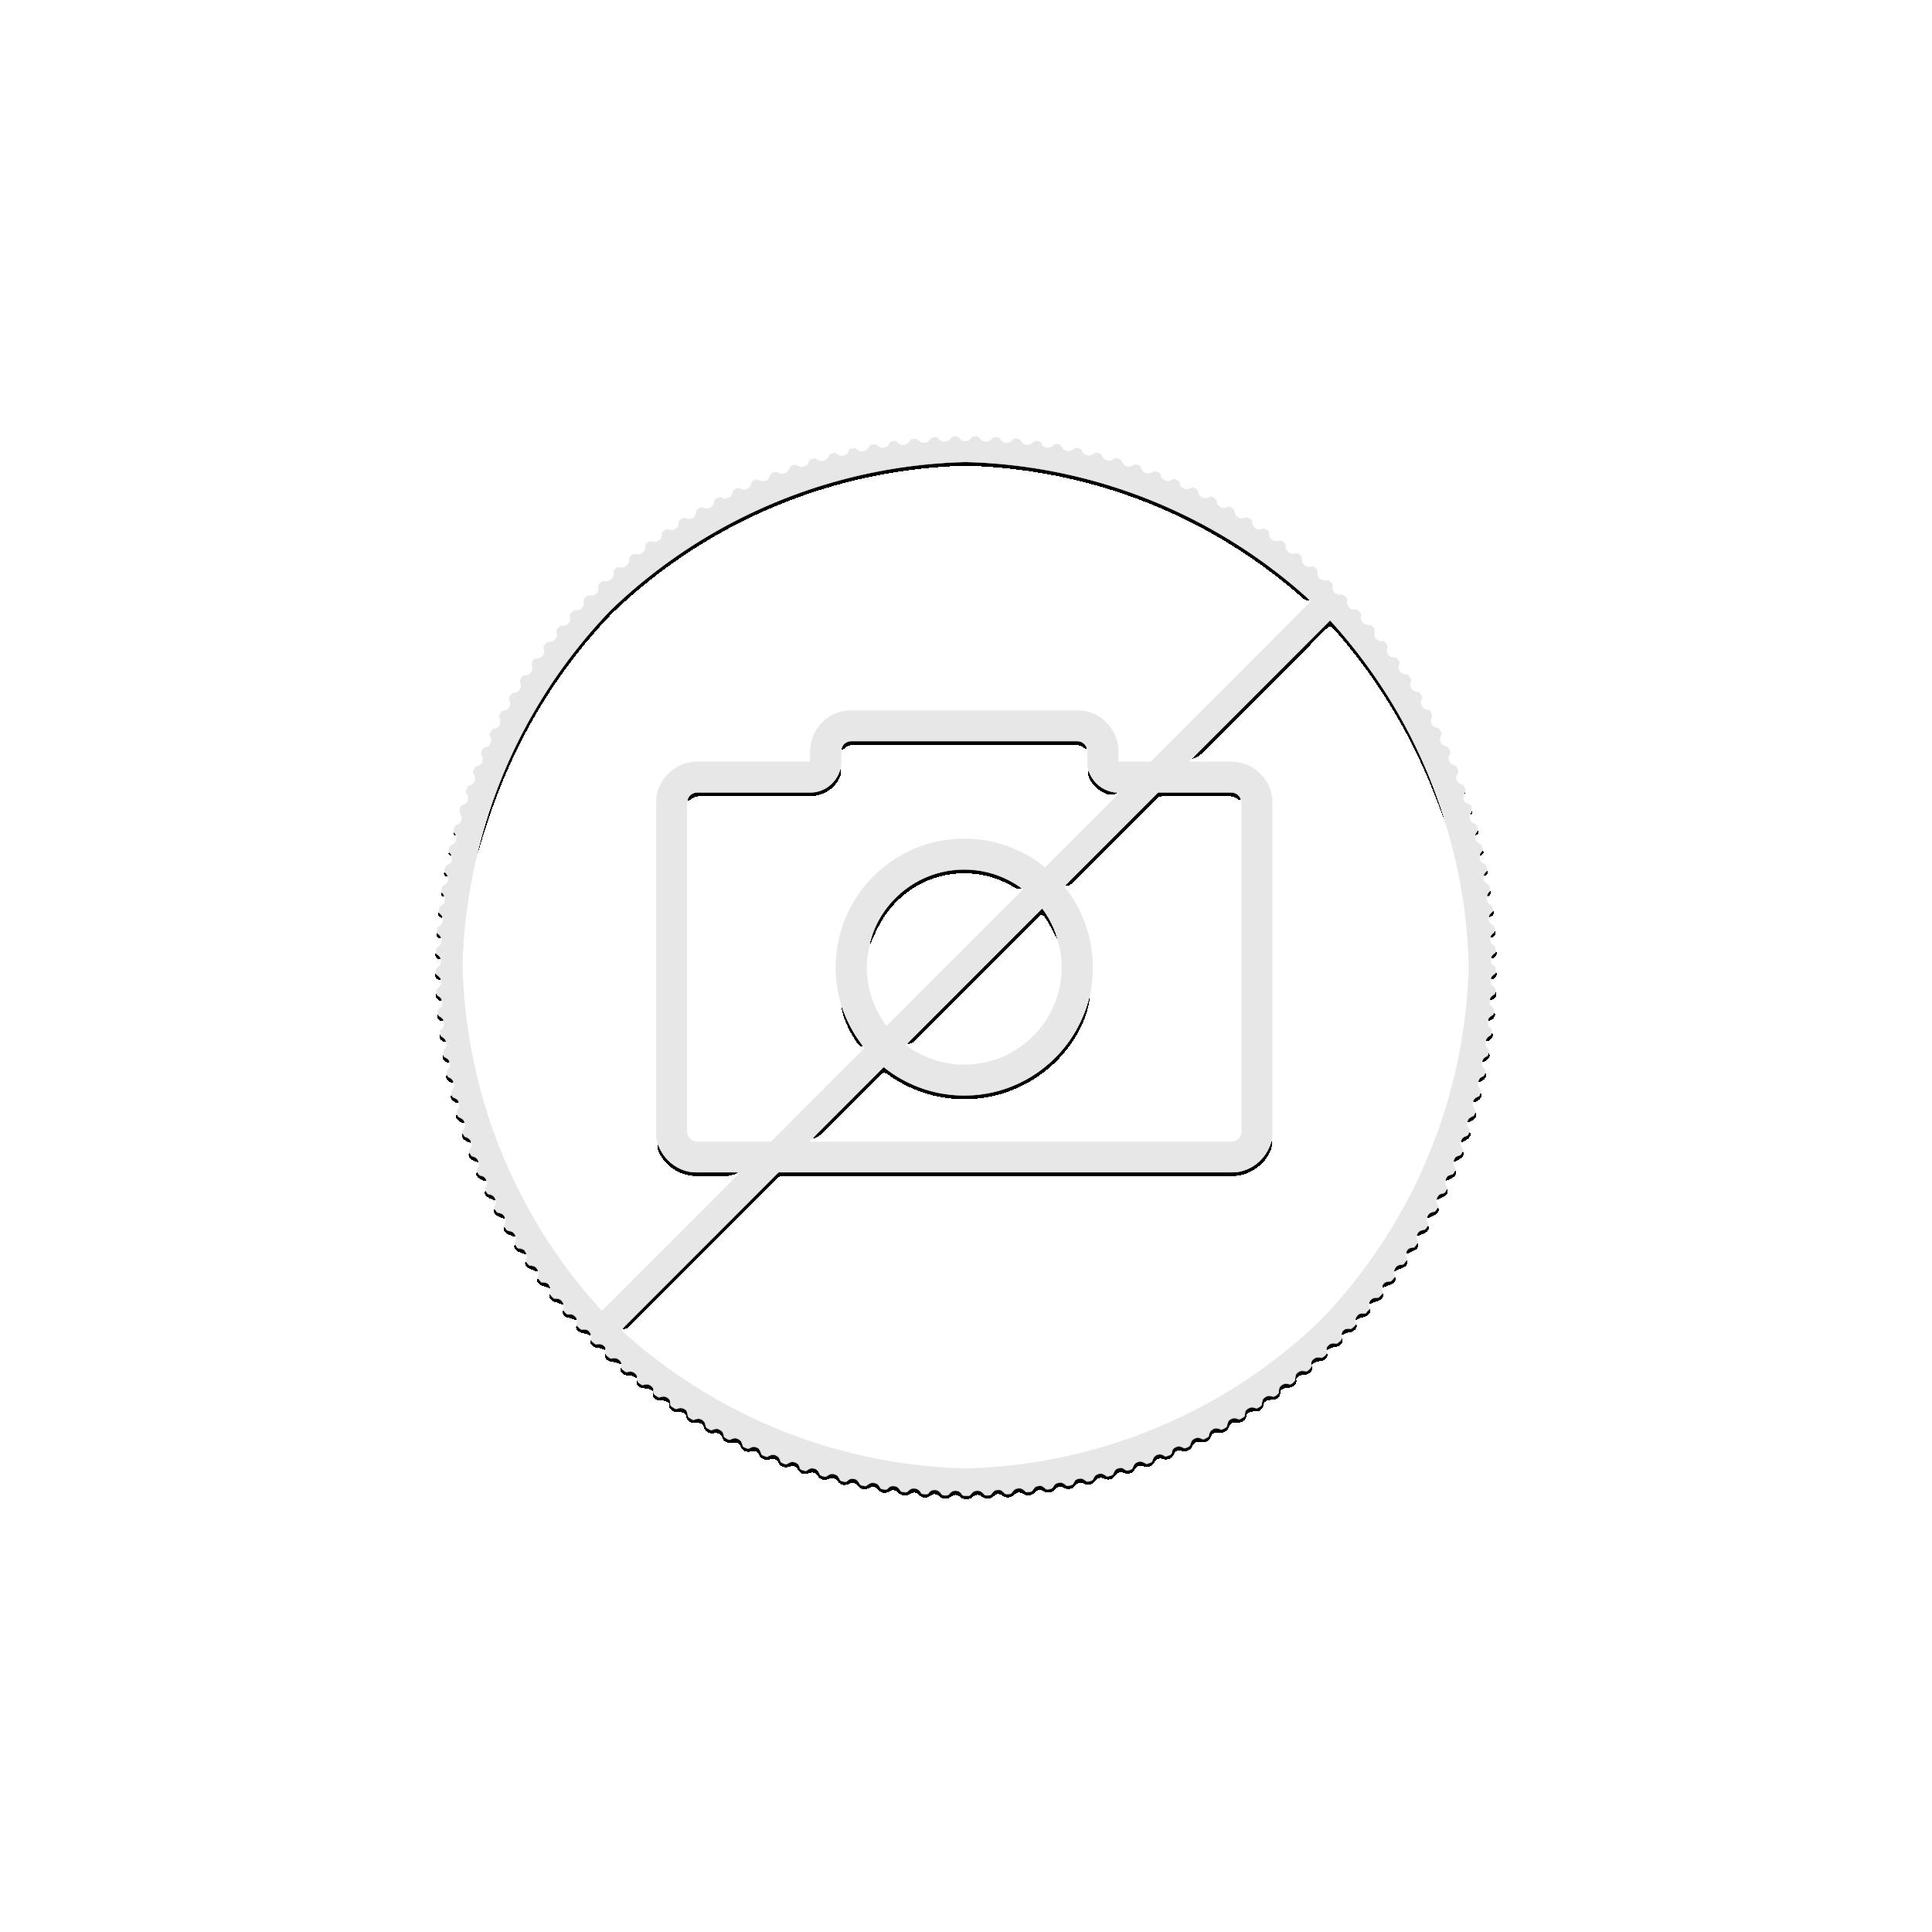 1 troy ounce zilveren munt Silver Eagle - Golden Ring serie